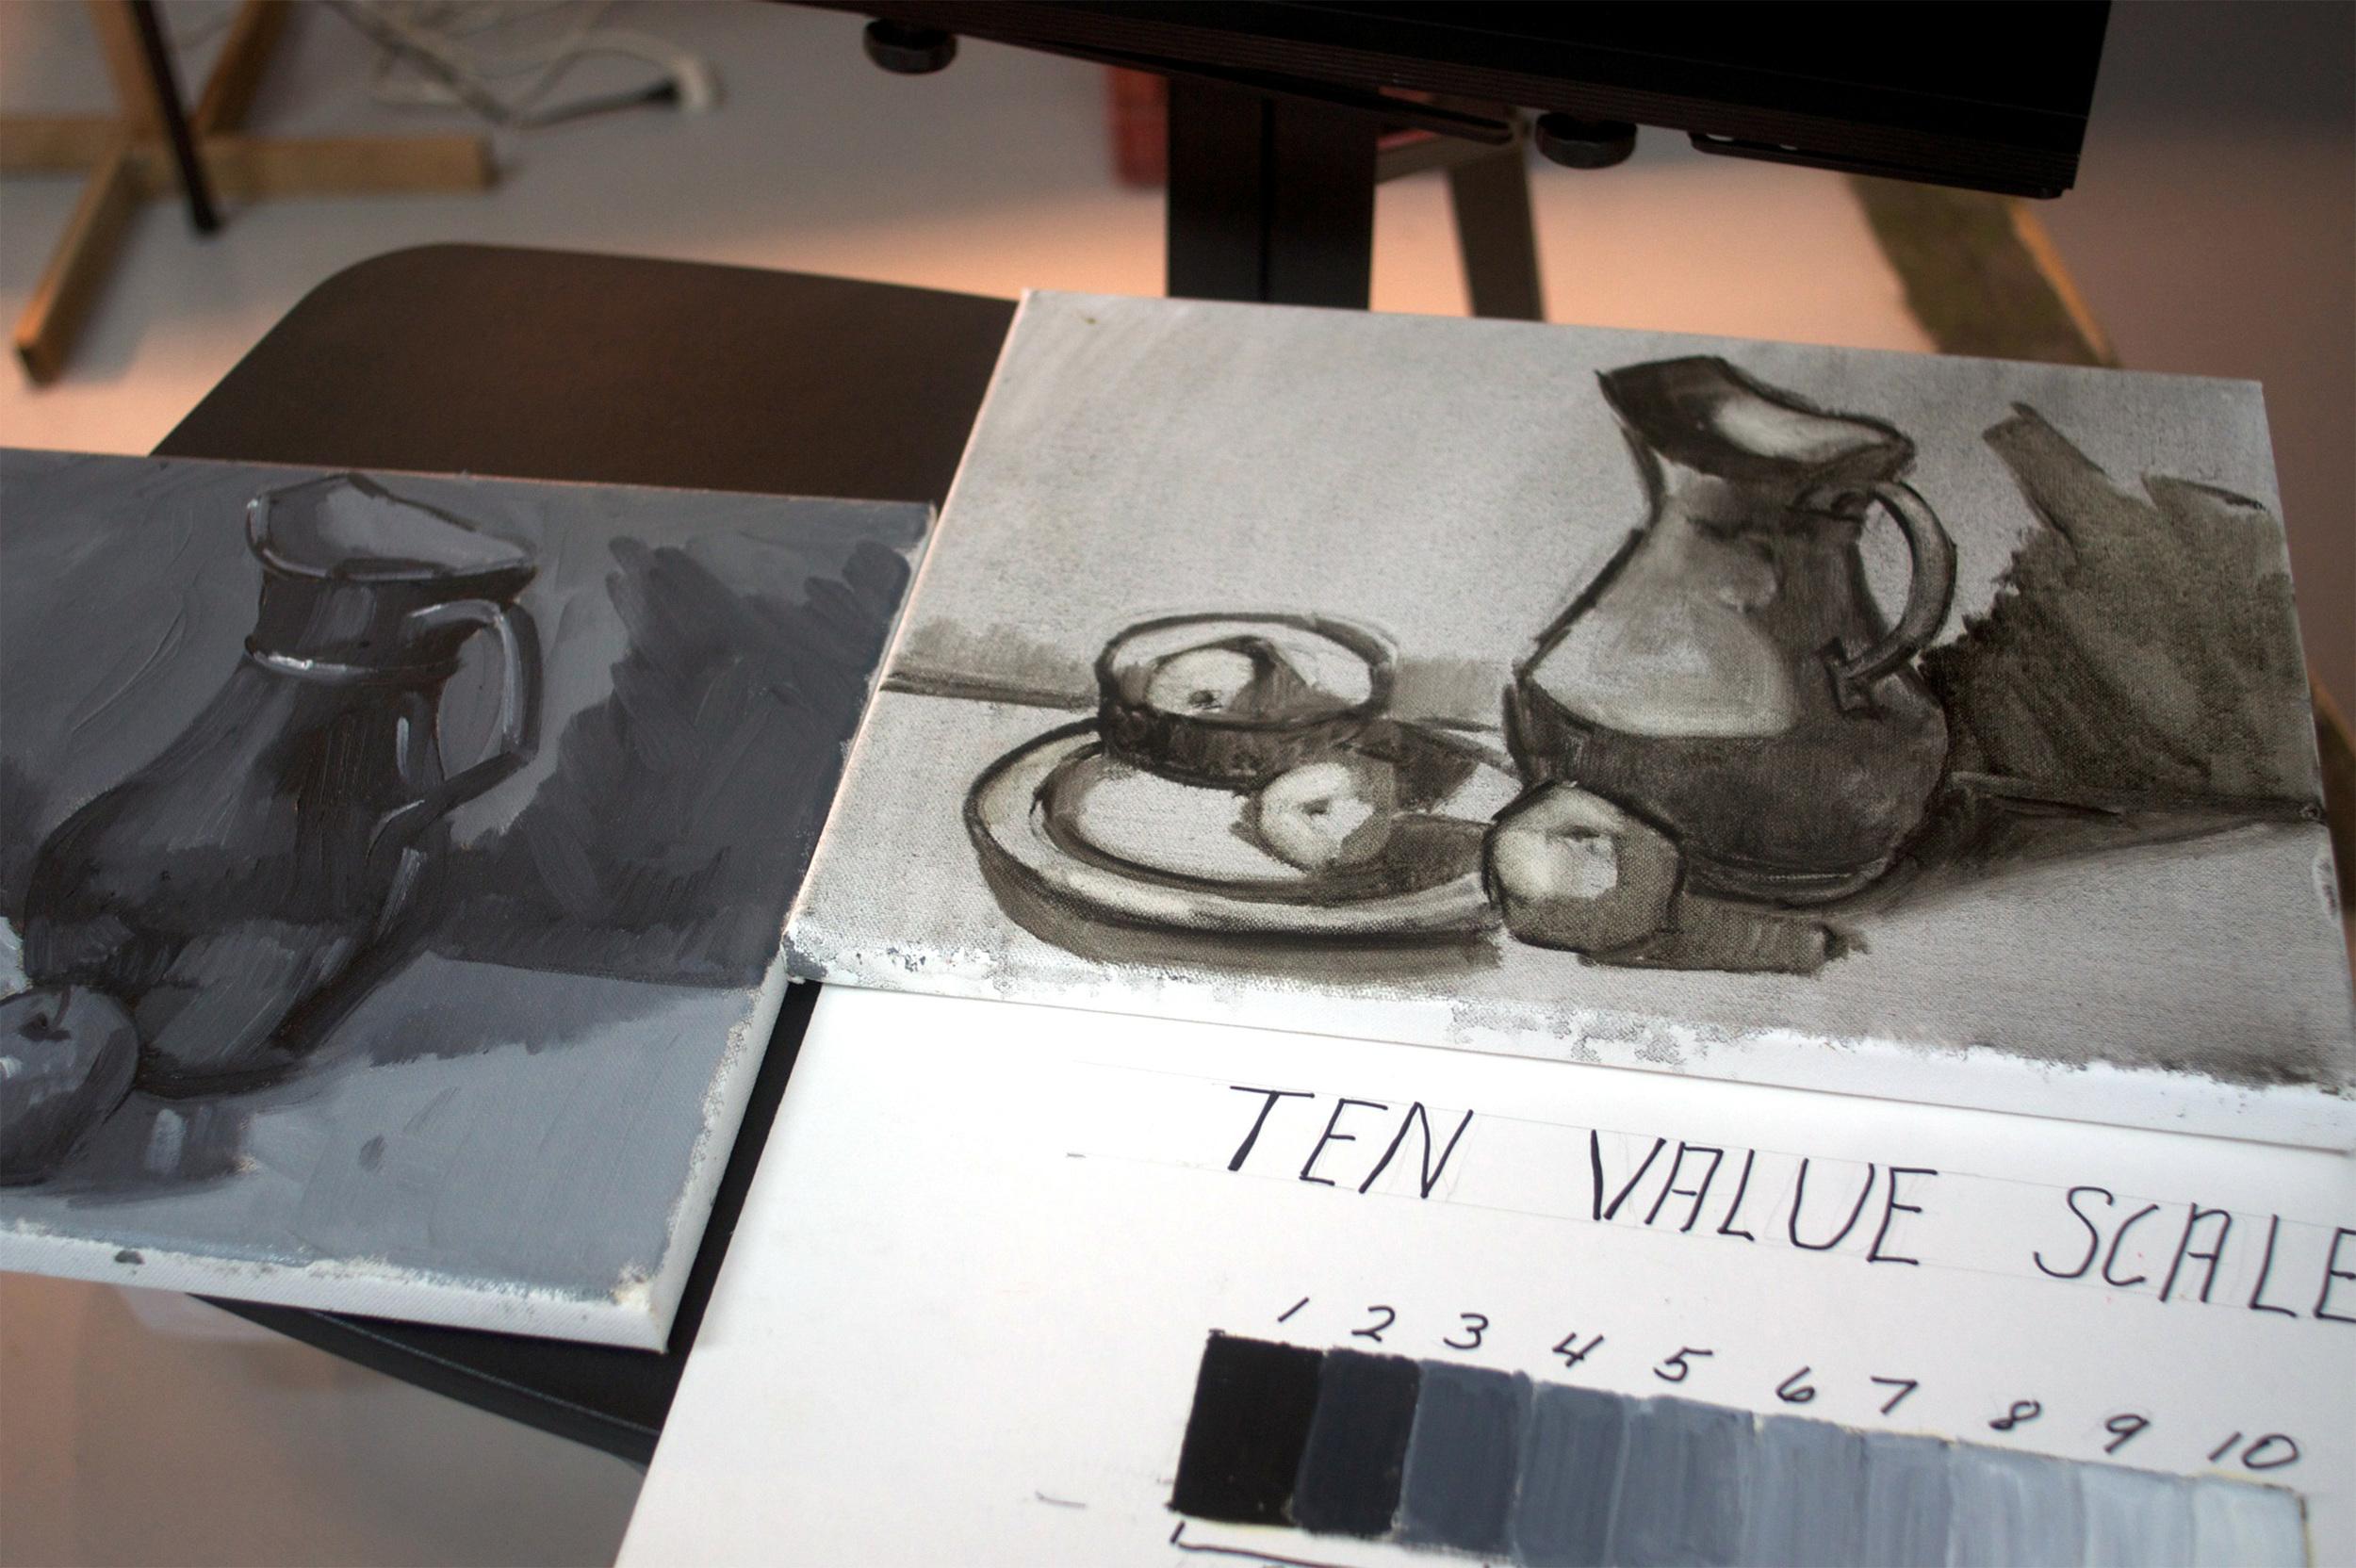 Workshop Student Tools